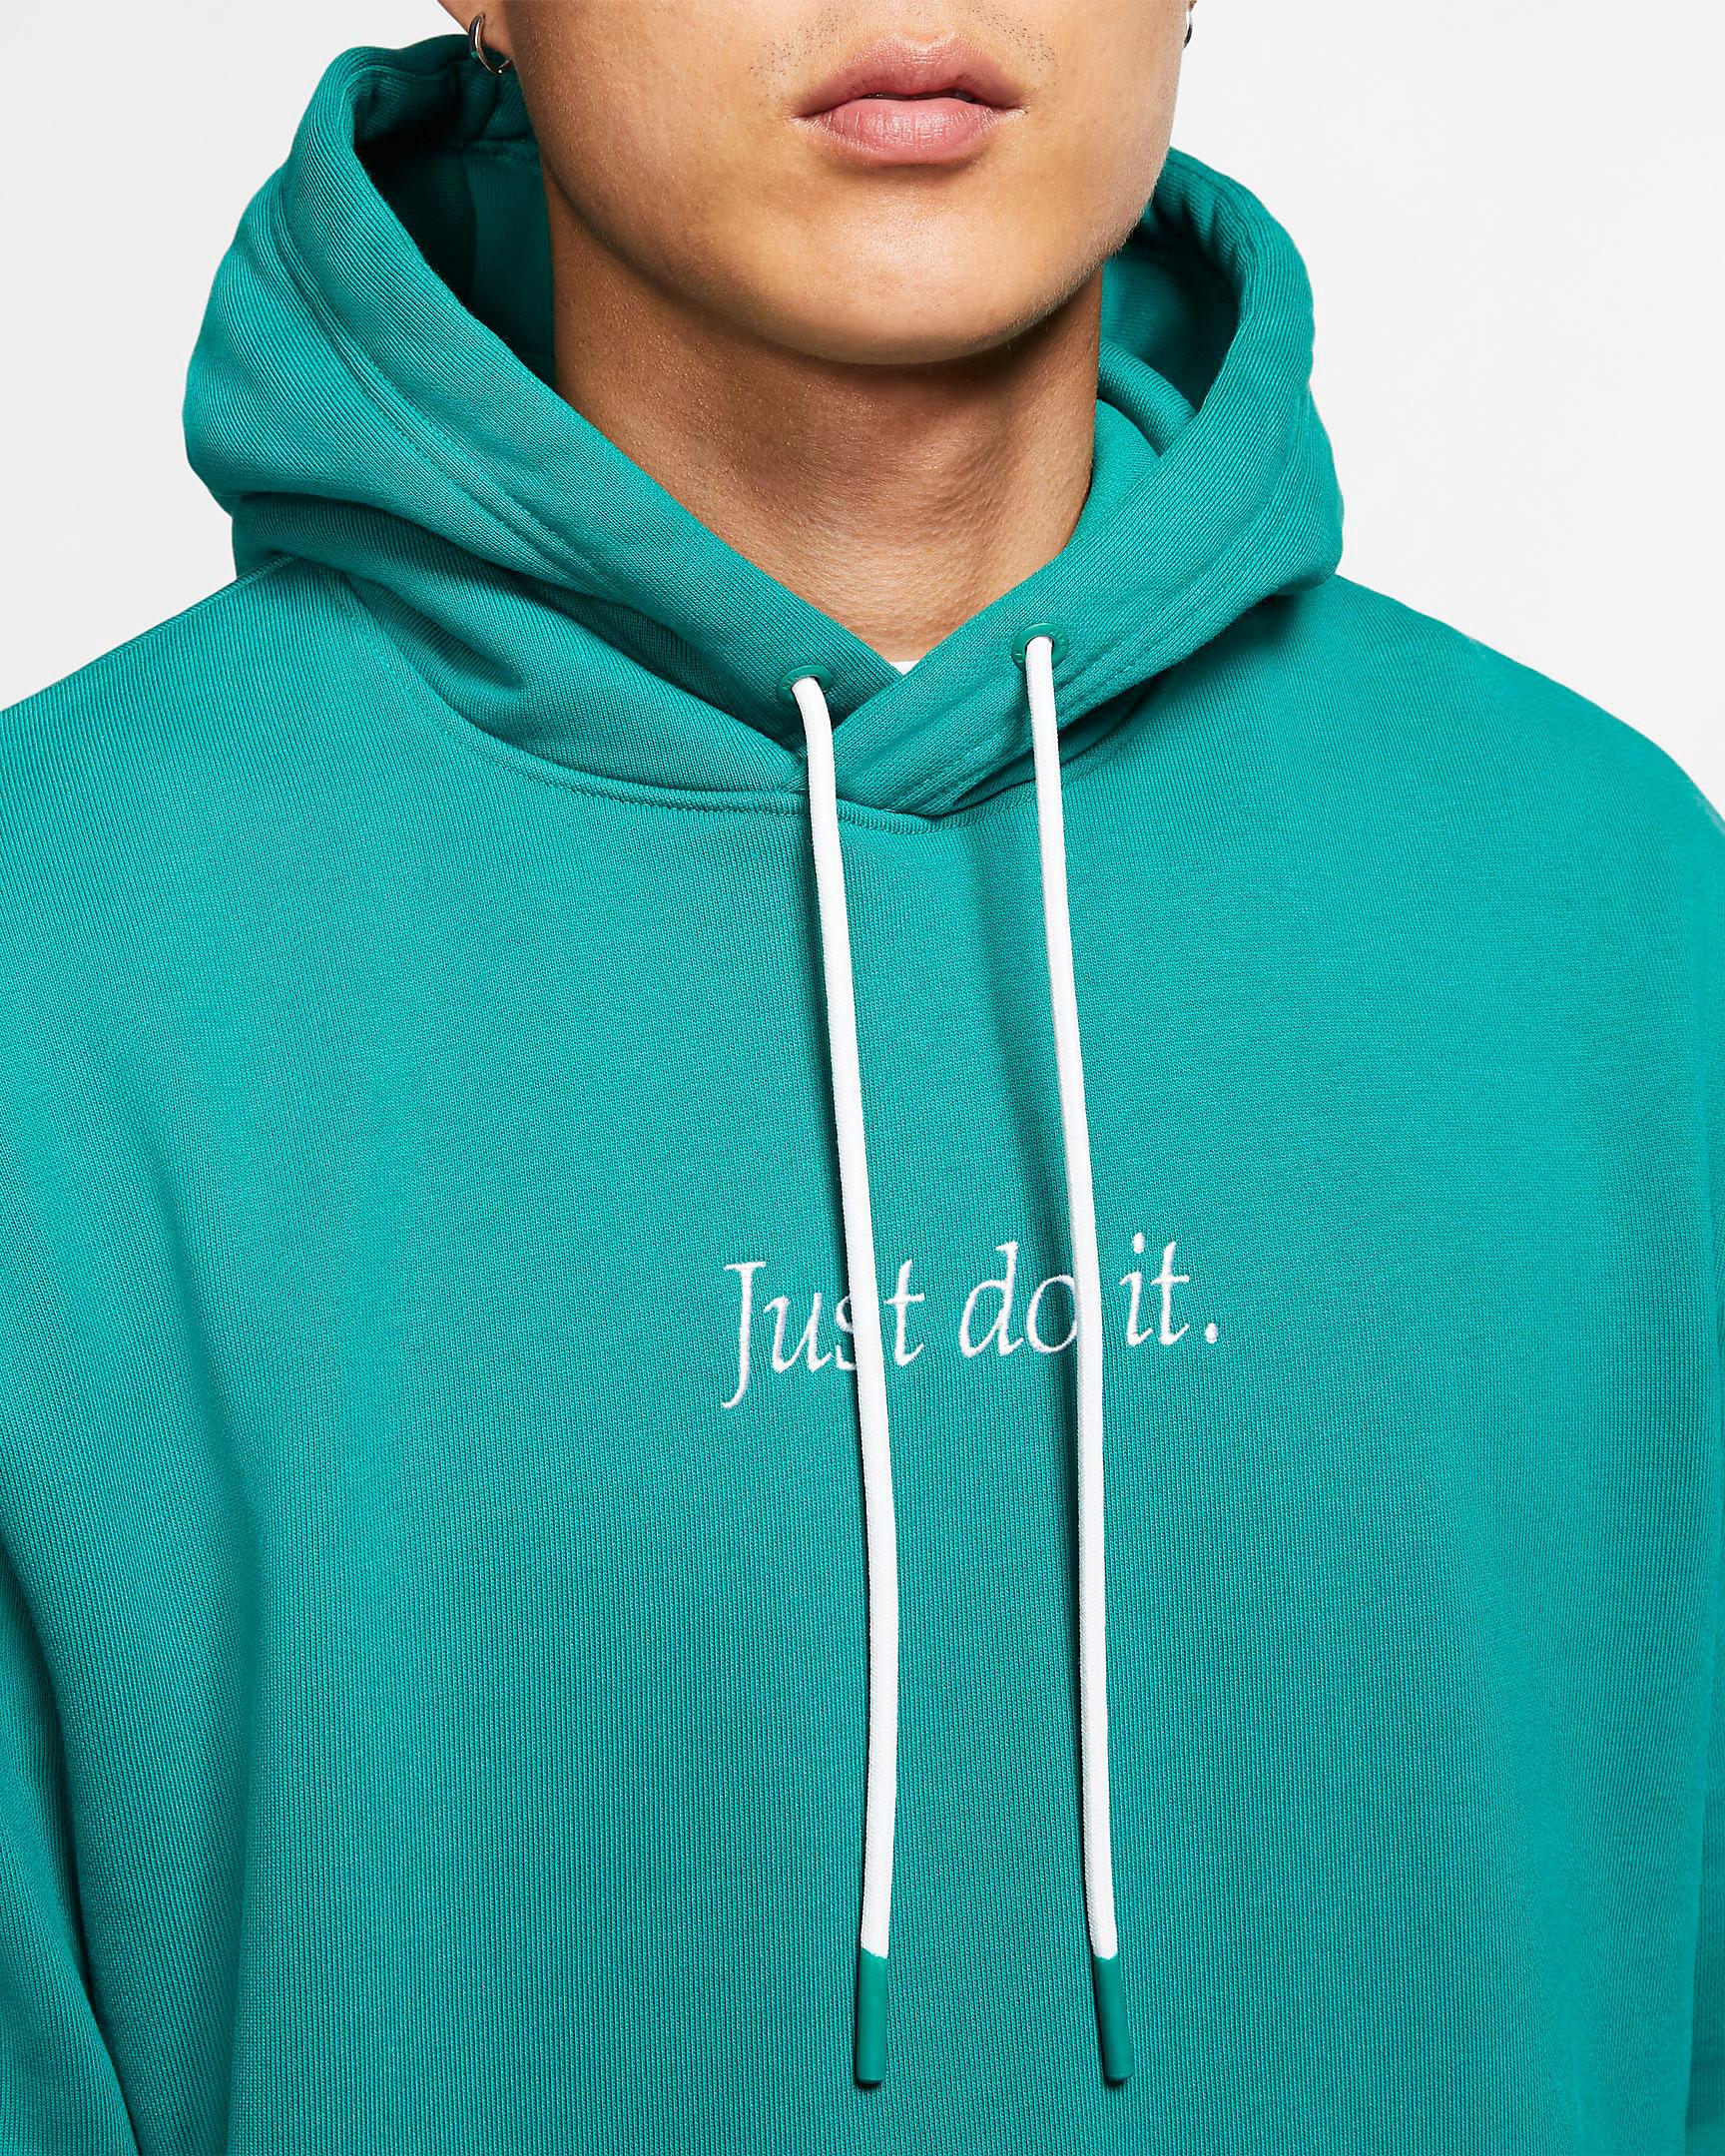 nike-island-green-just-do-it-hoodie-1